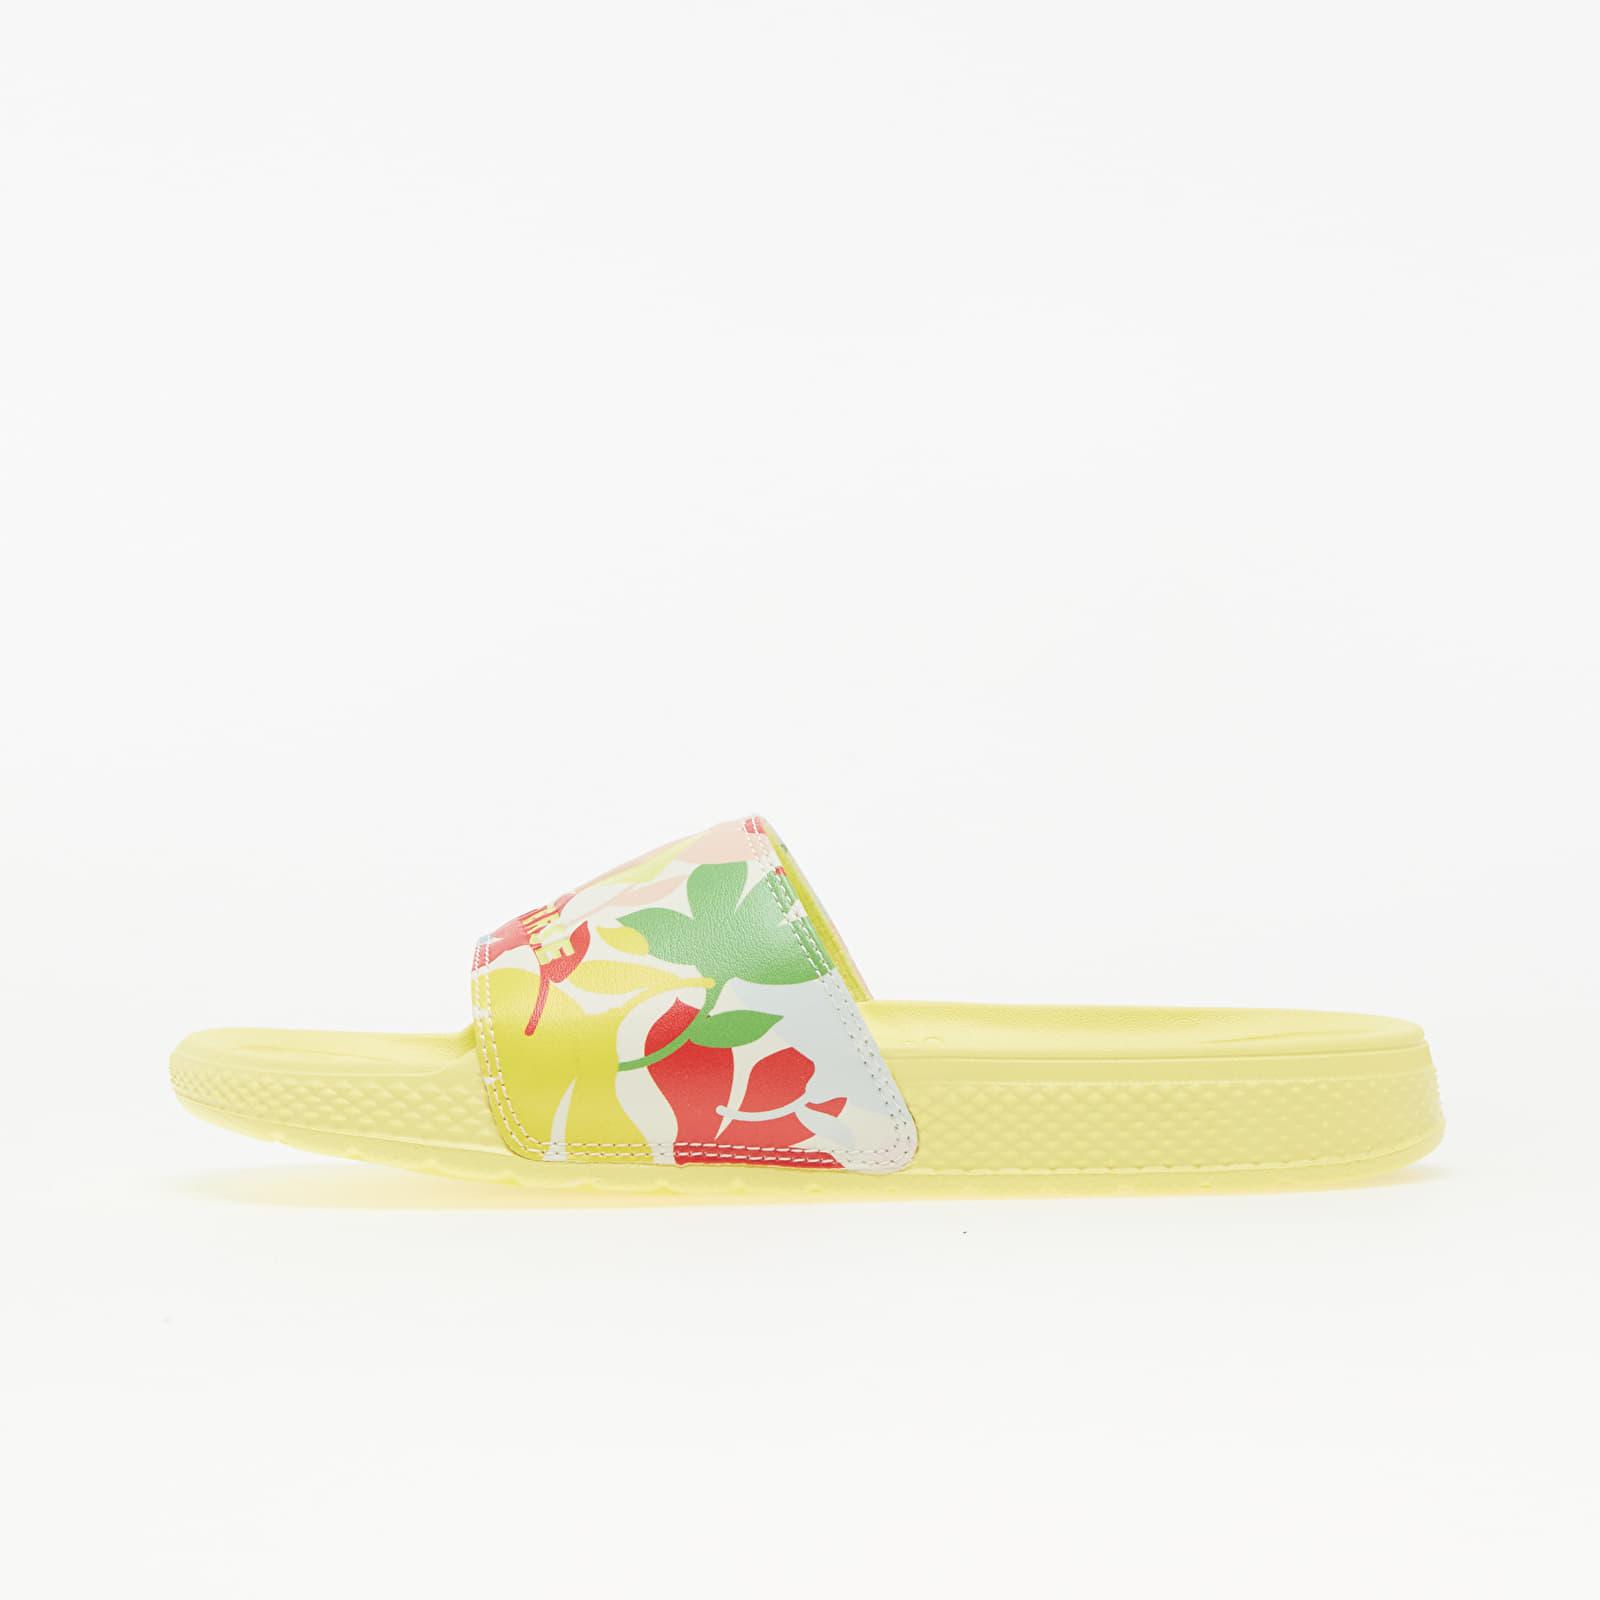 Converse All Star Slide Lt Zitron/ Egret/ Pink Foam EUR 37.5